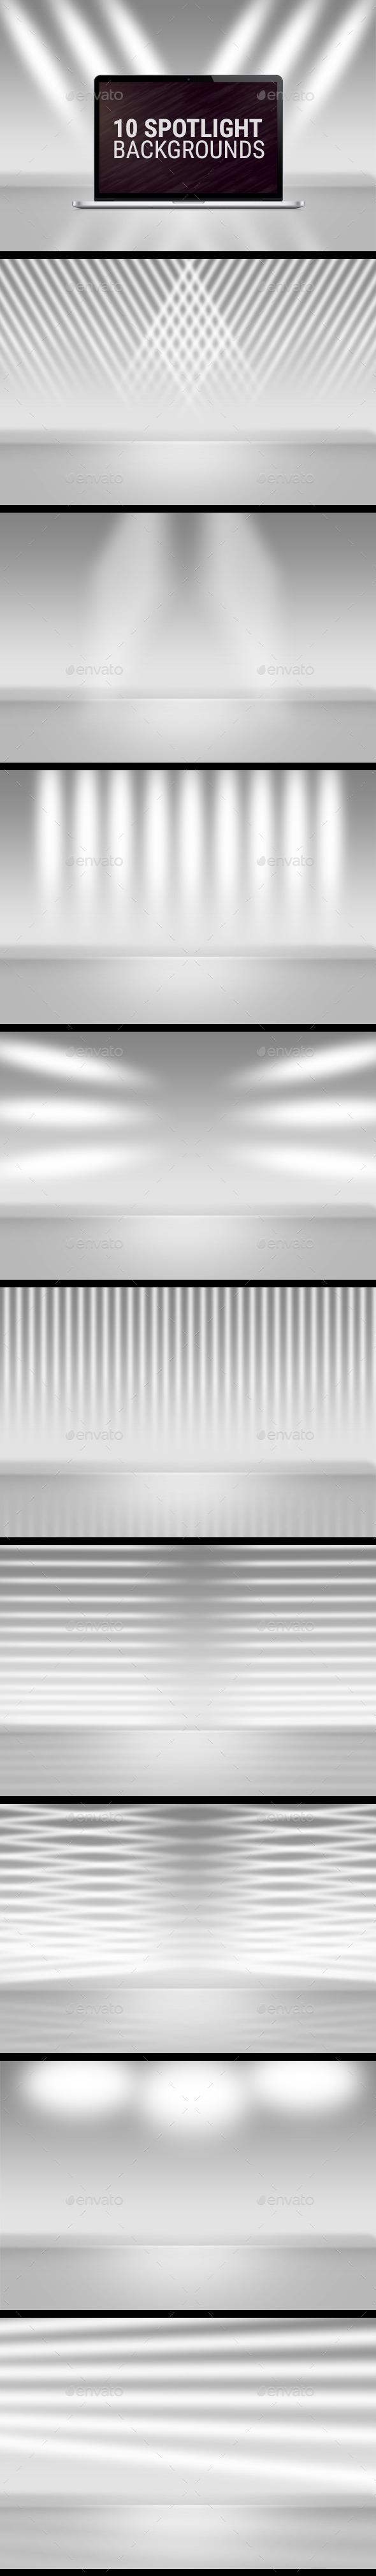 10 Spotlight Backgrounds - Backgrounds Graphics